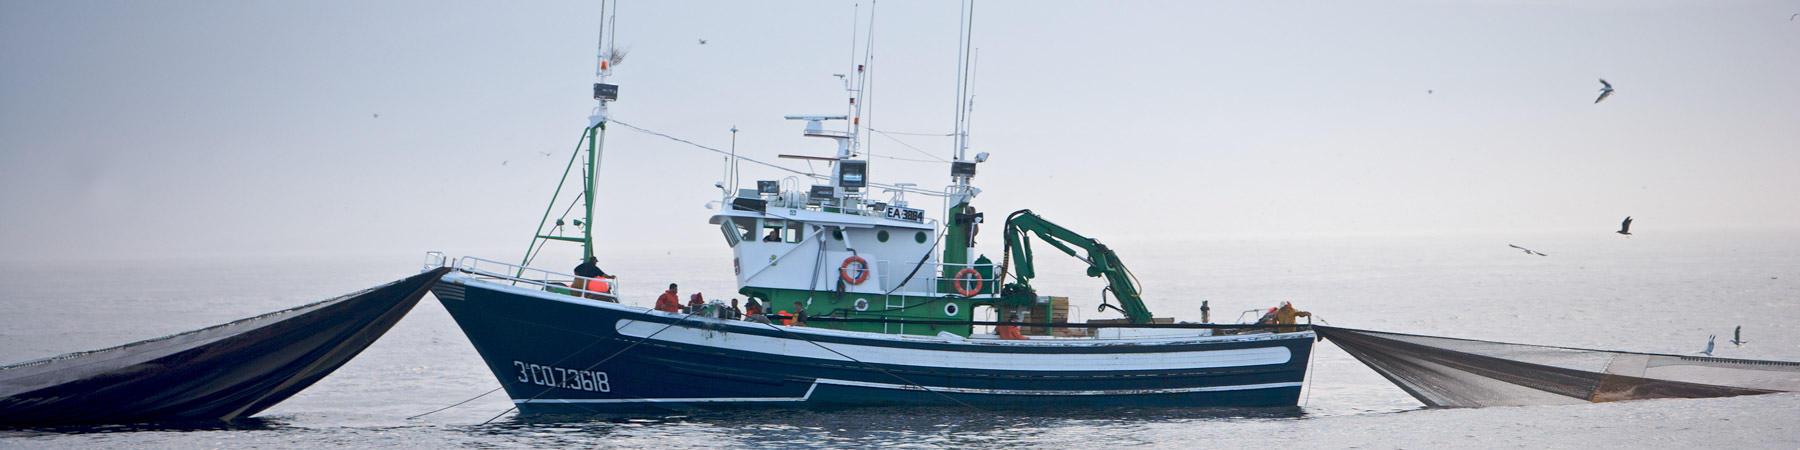 bateau peche sardine